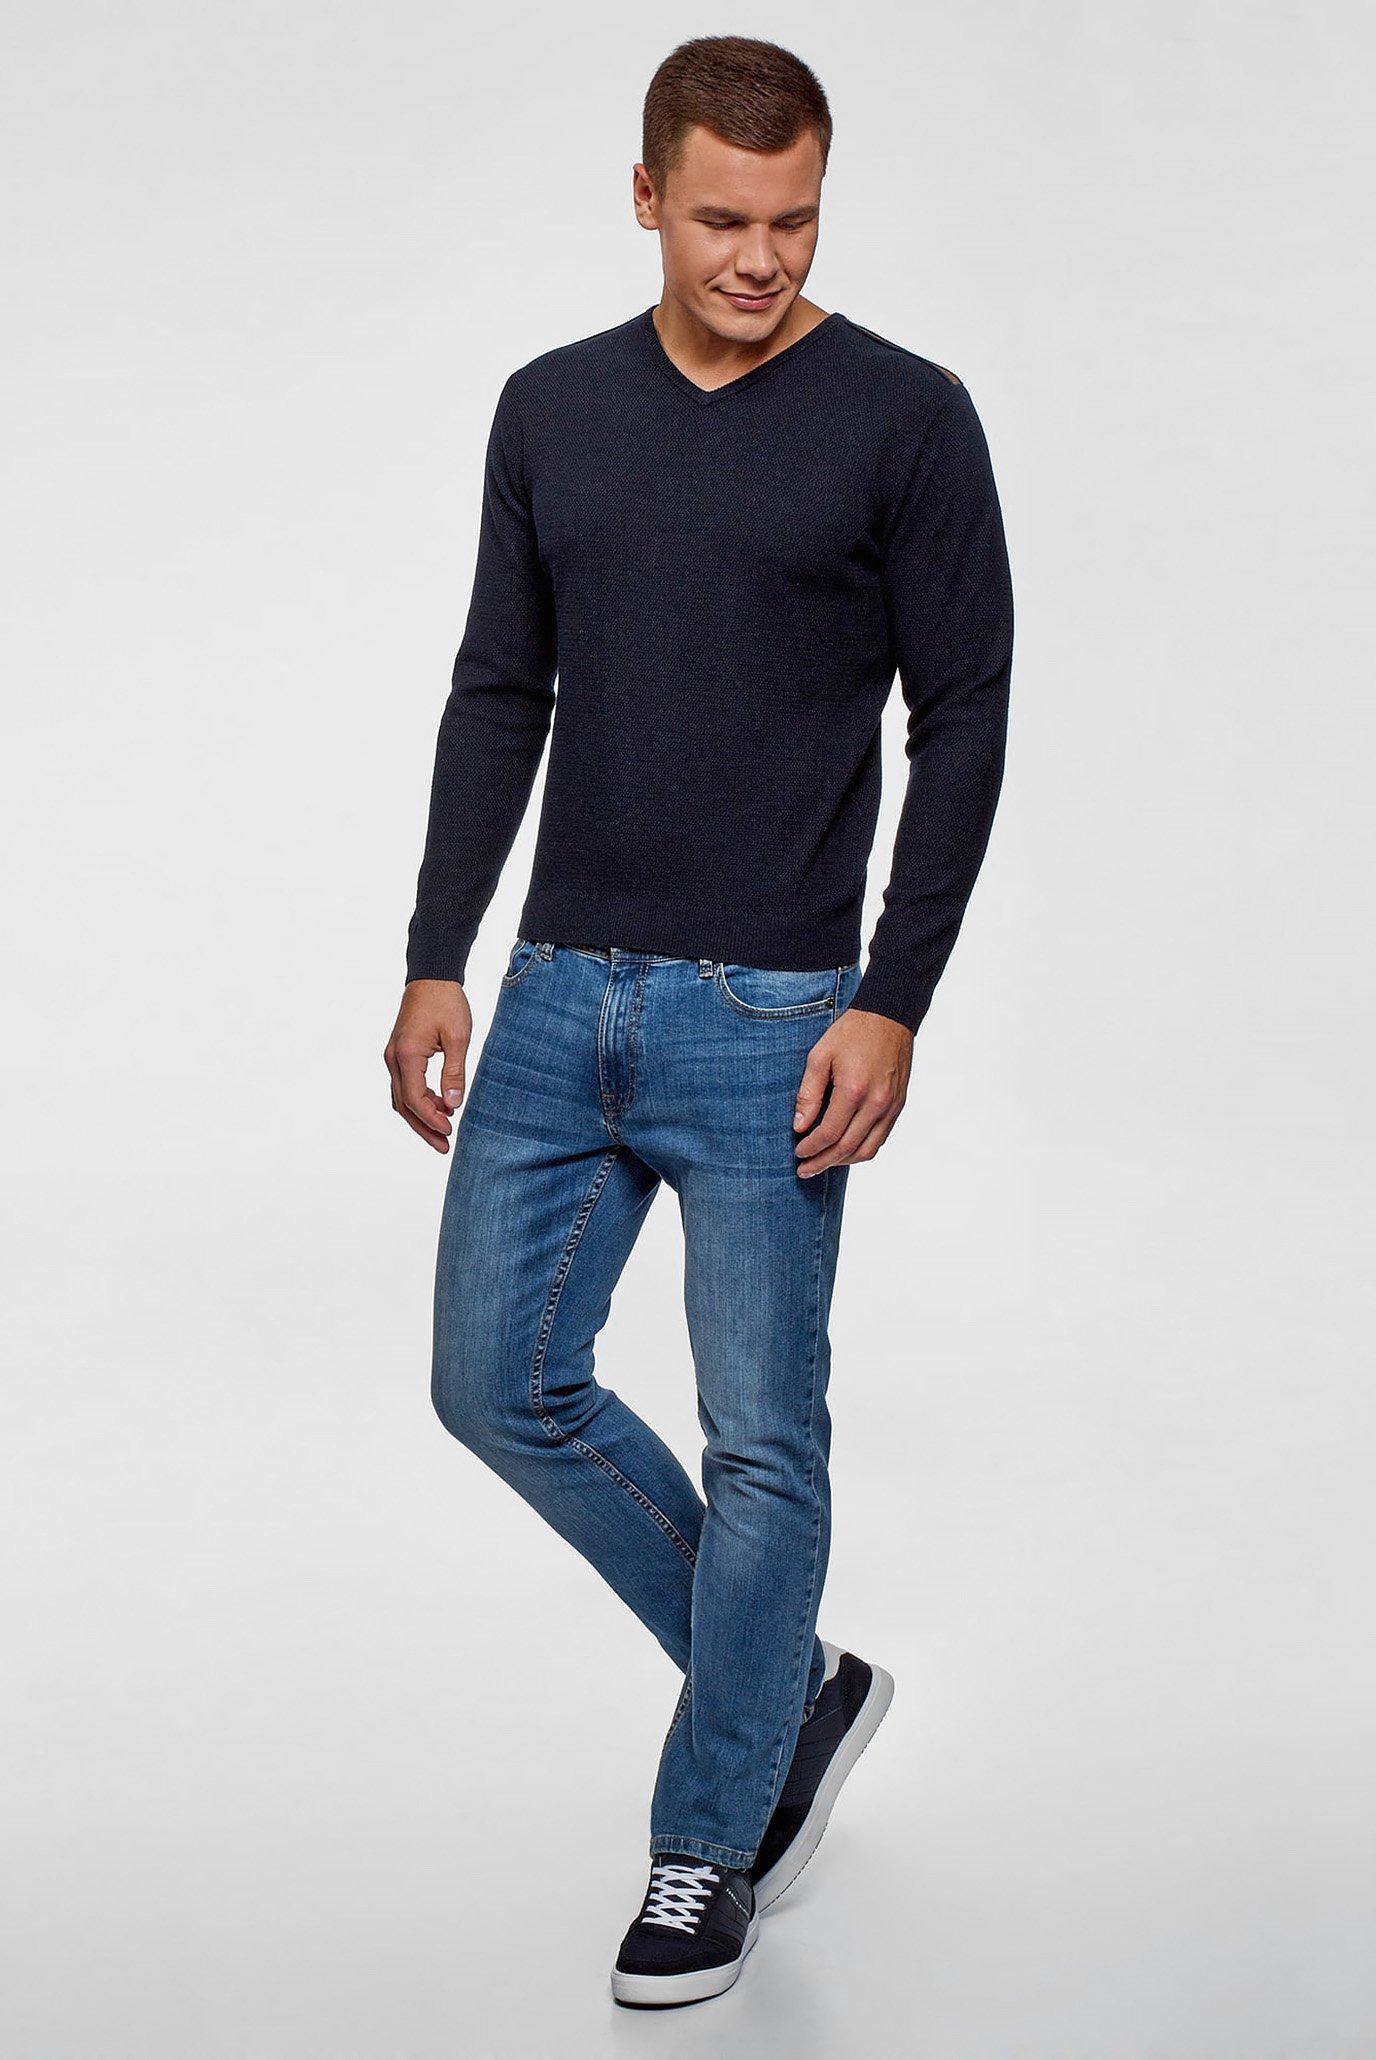 Мужской синий пуловер Oodji